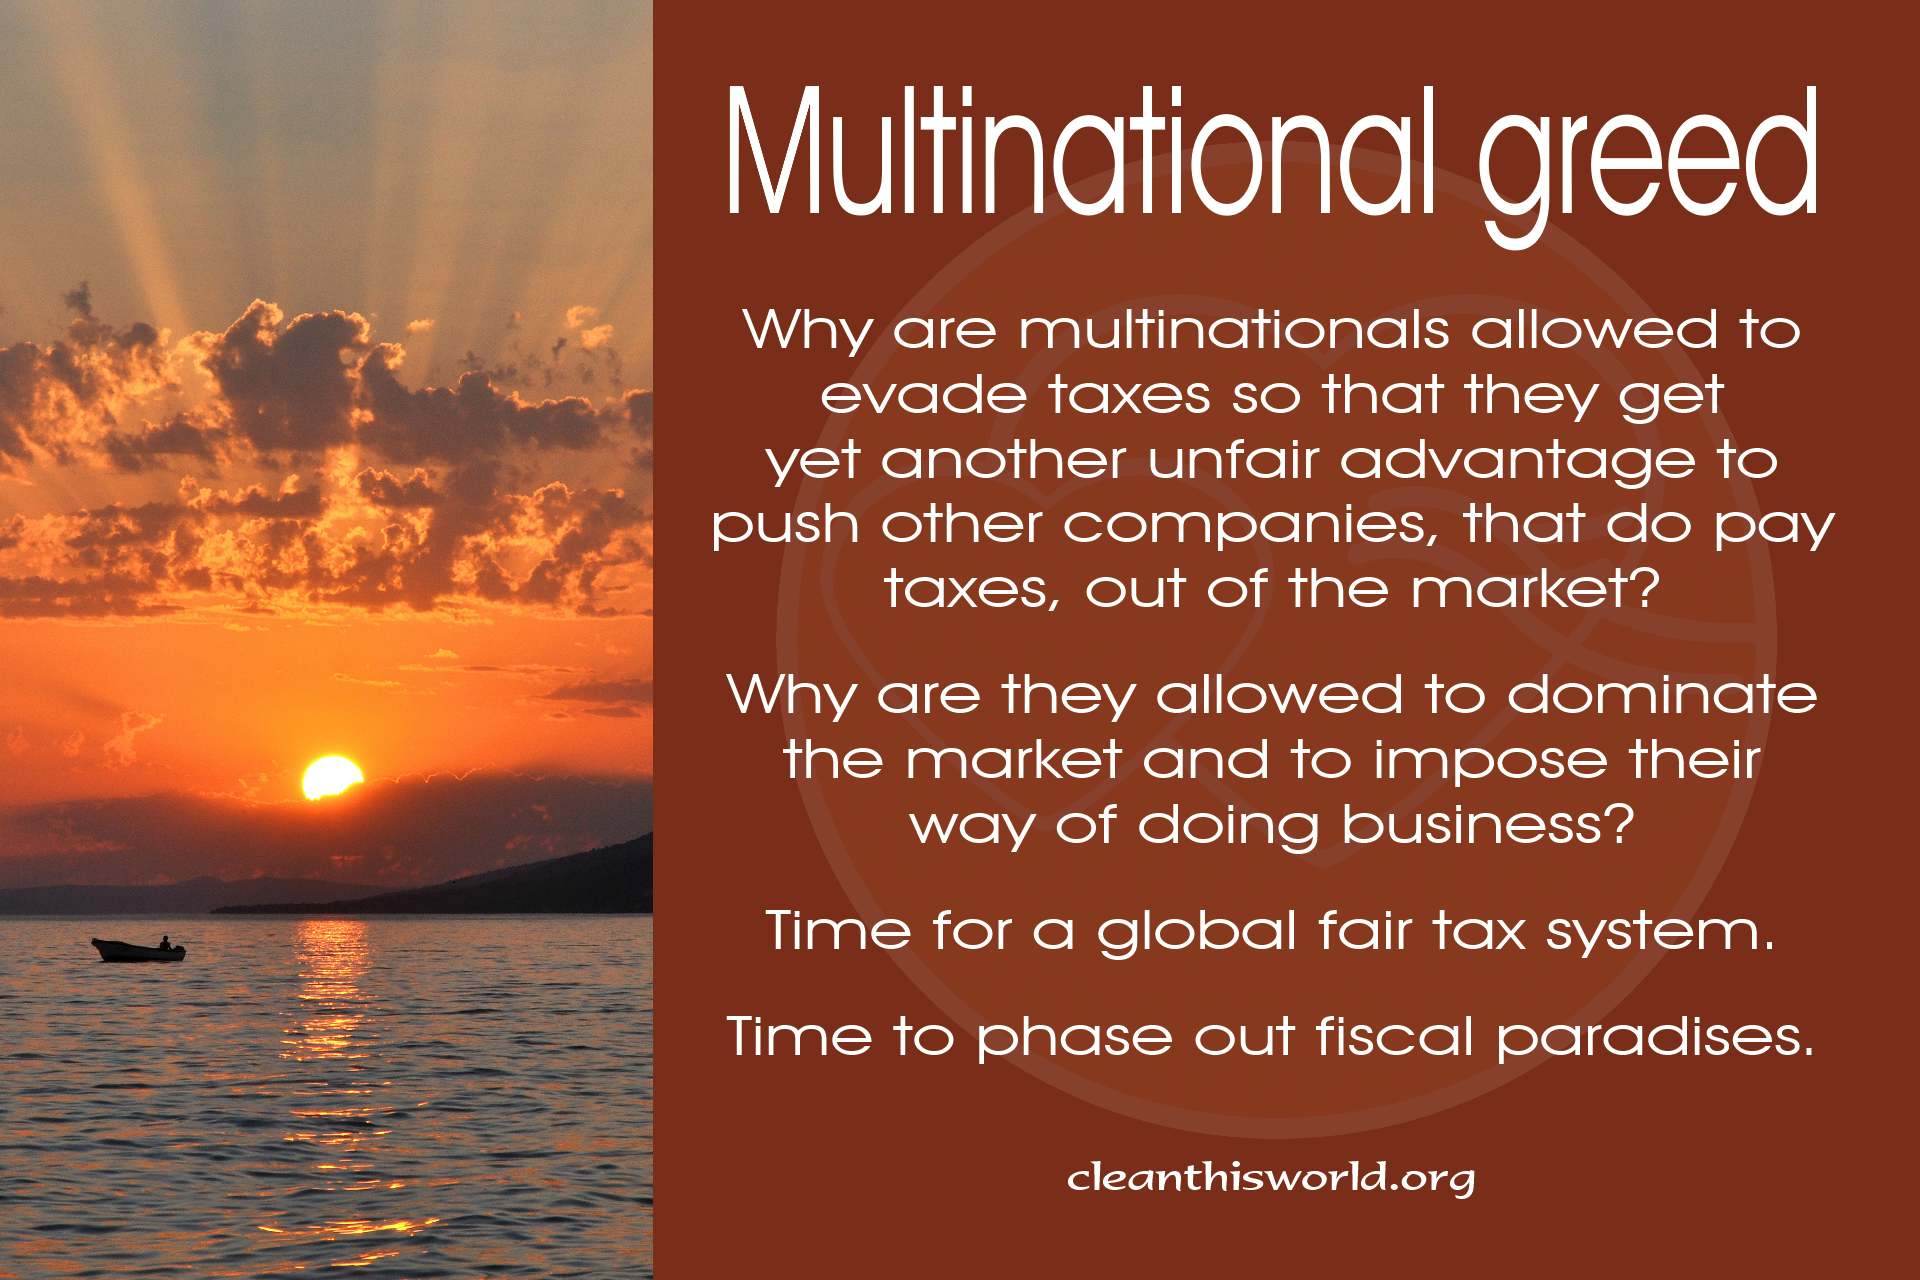 Multinational greed